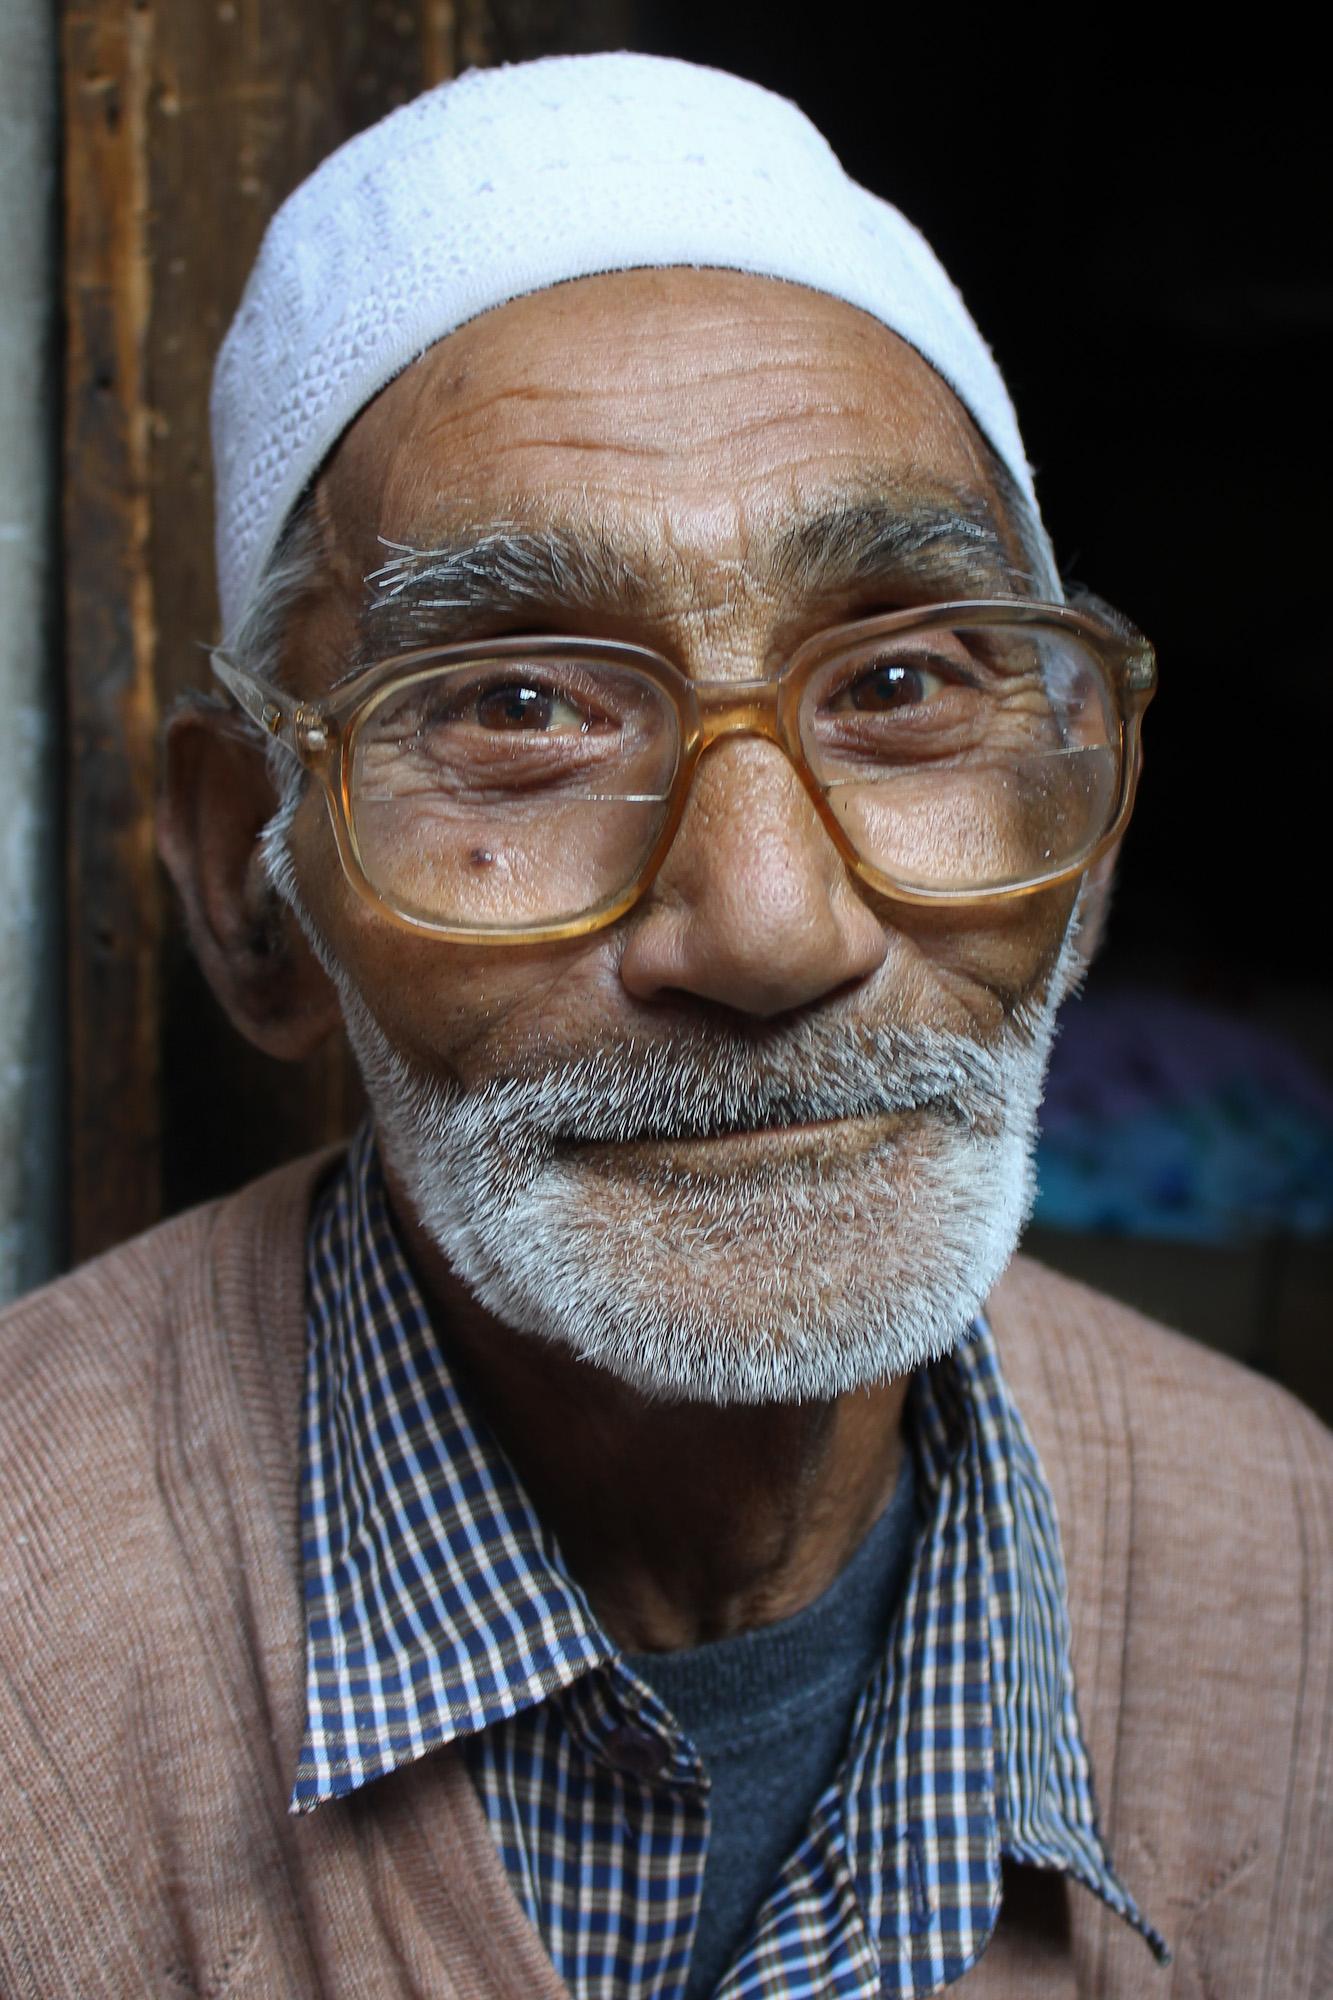 Man we met while walking in the neighborhood markets of Srinagar, Kashmir